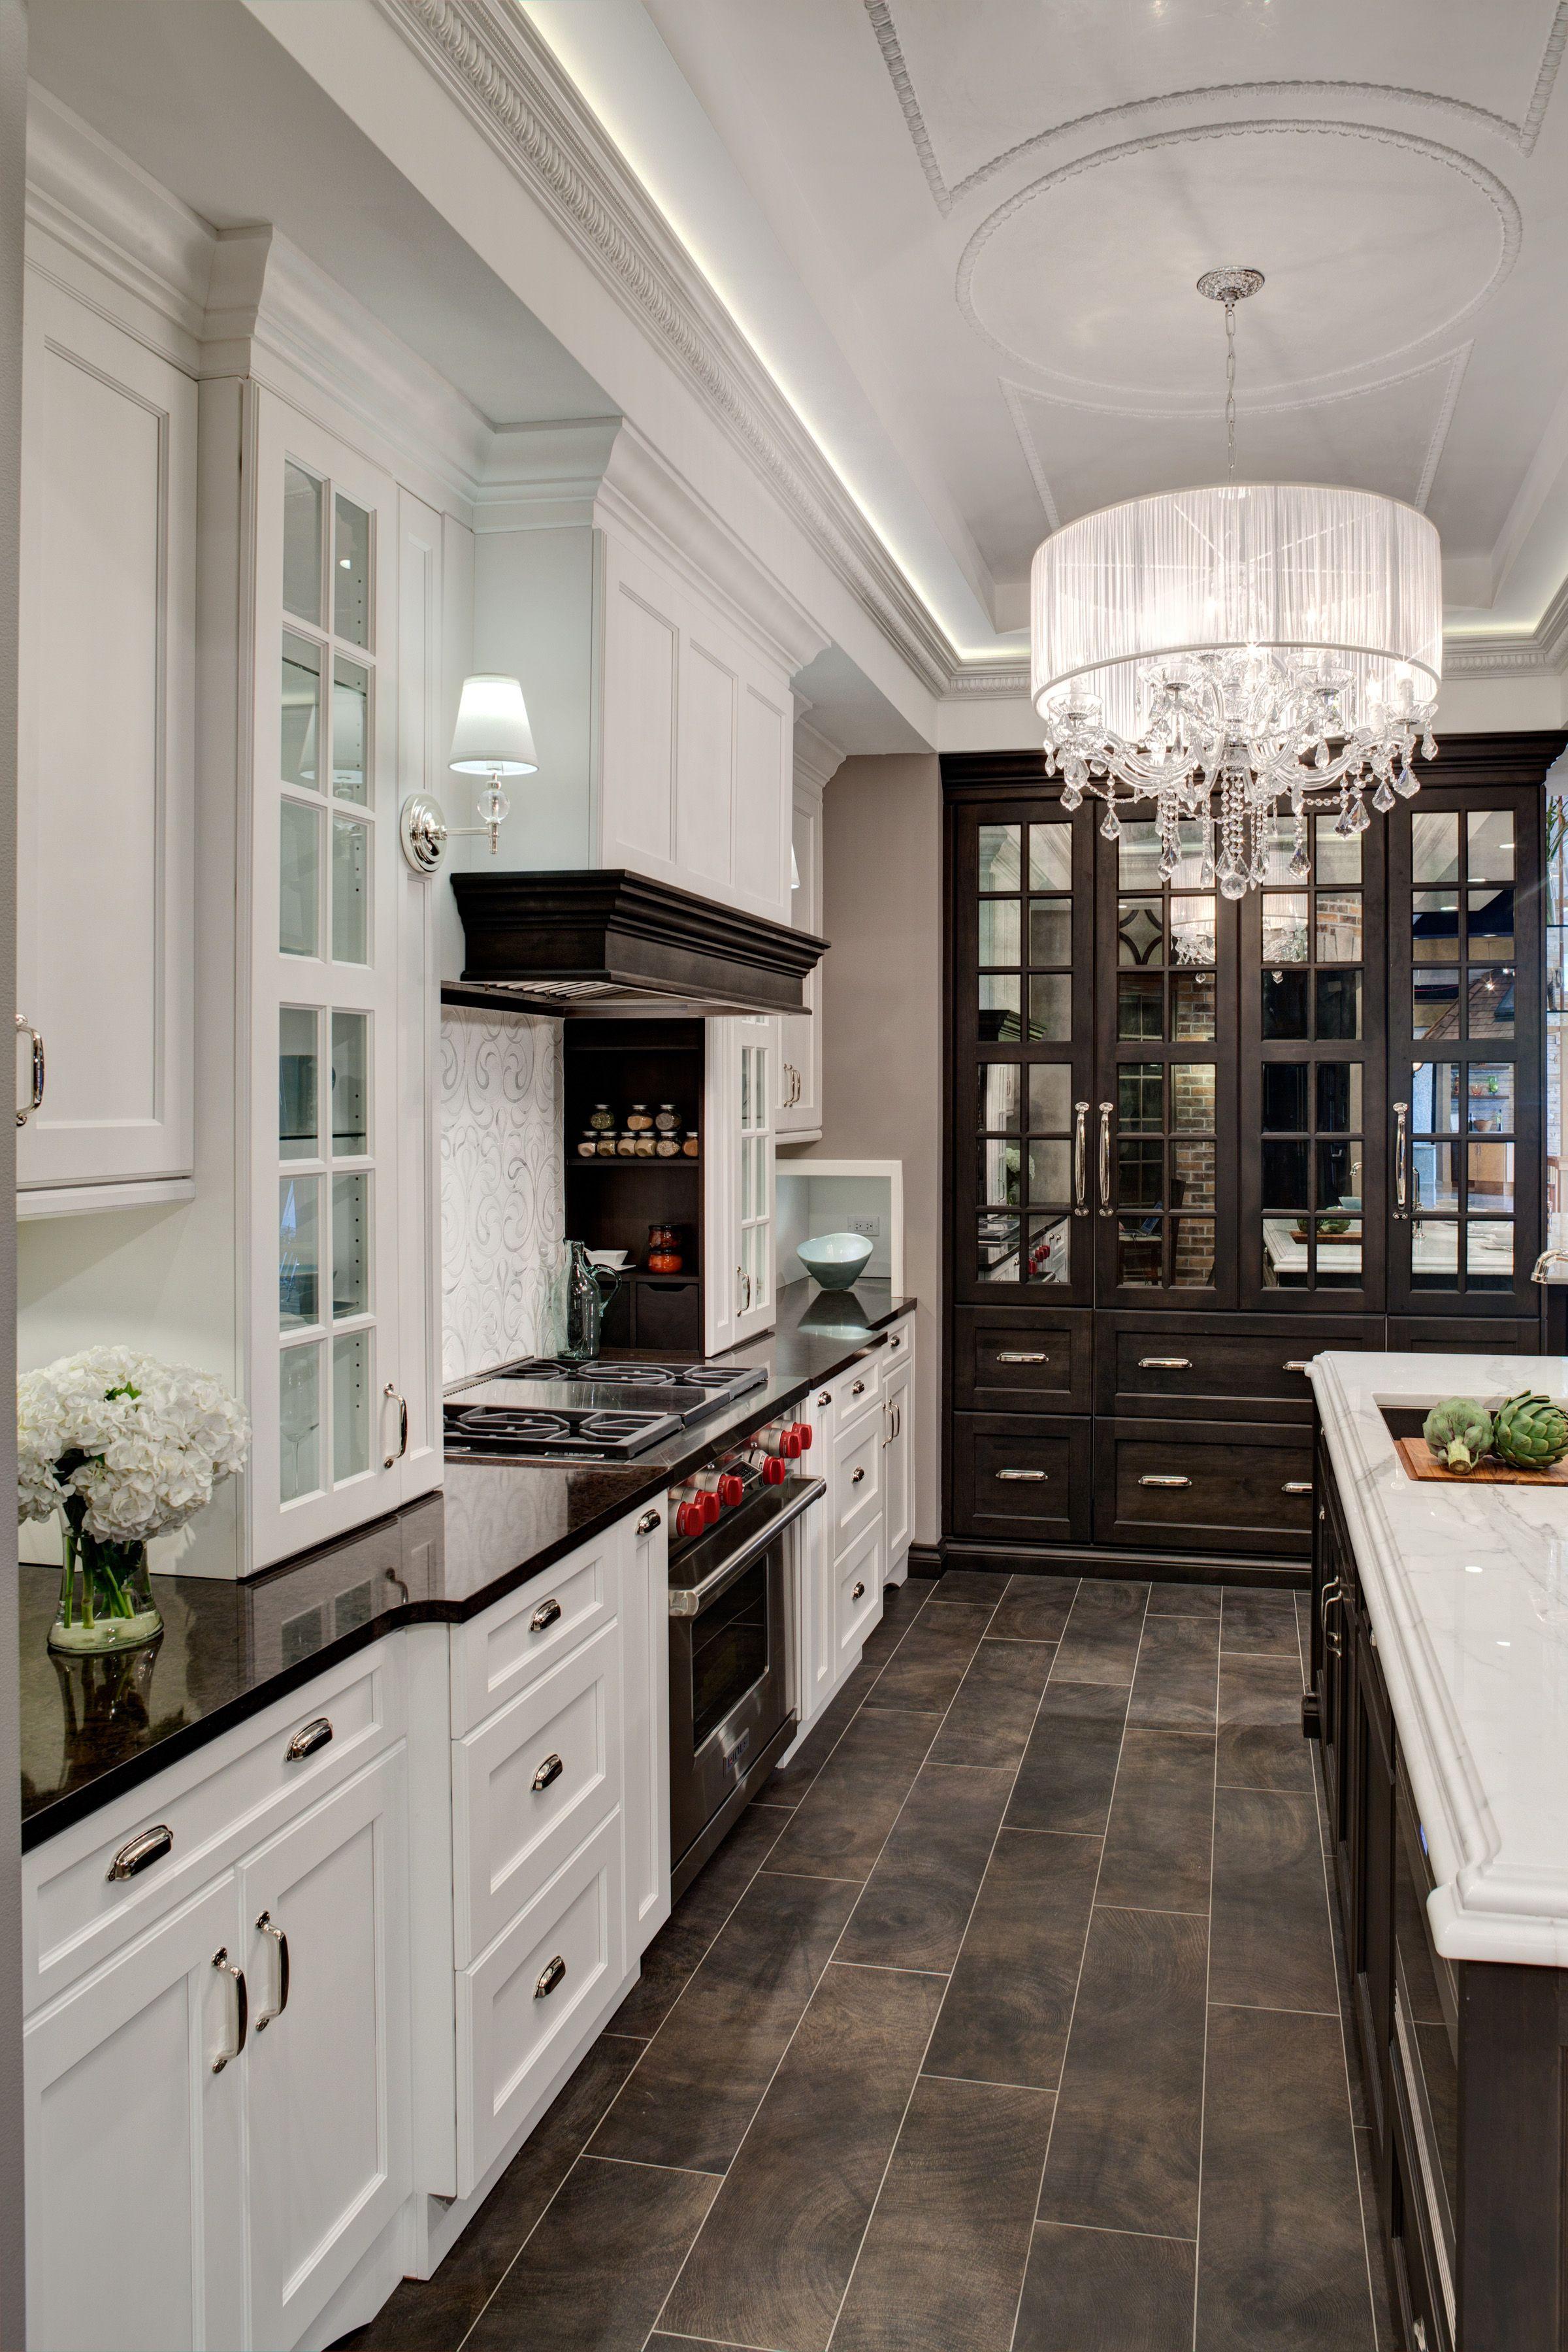 Lincolnwood design showroom kitchen display kitchen pinterest